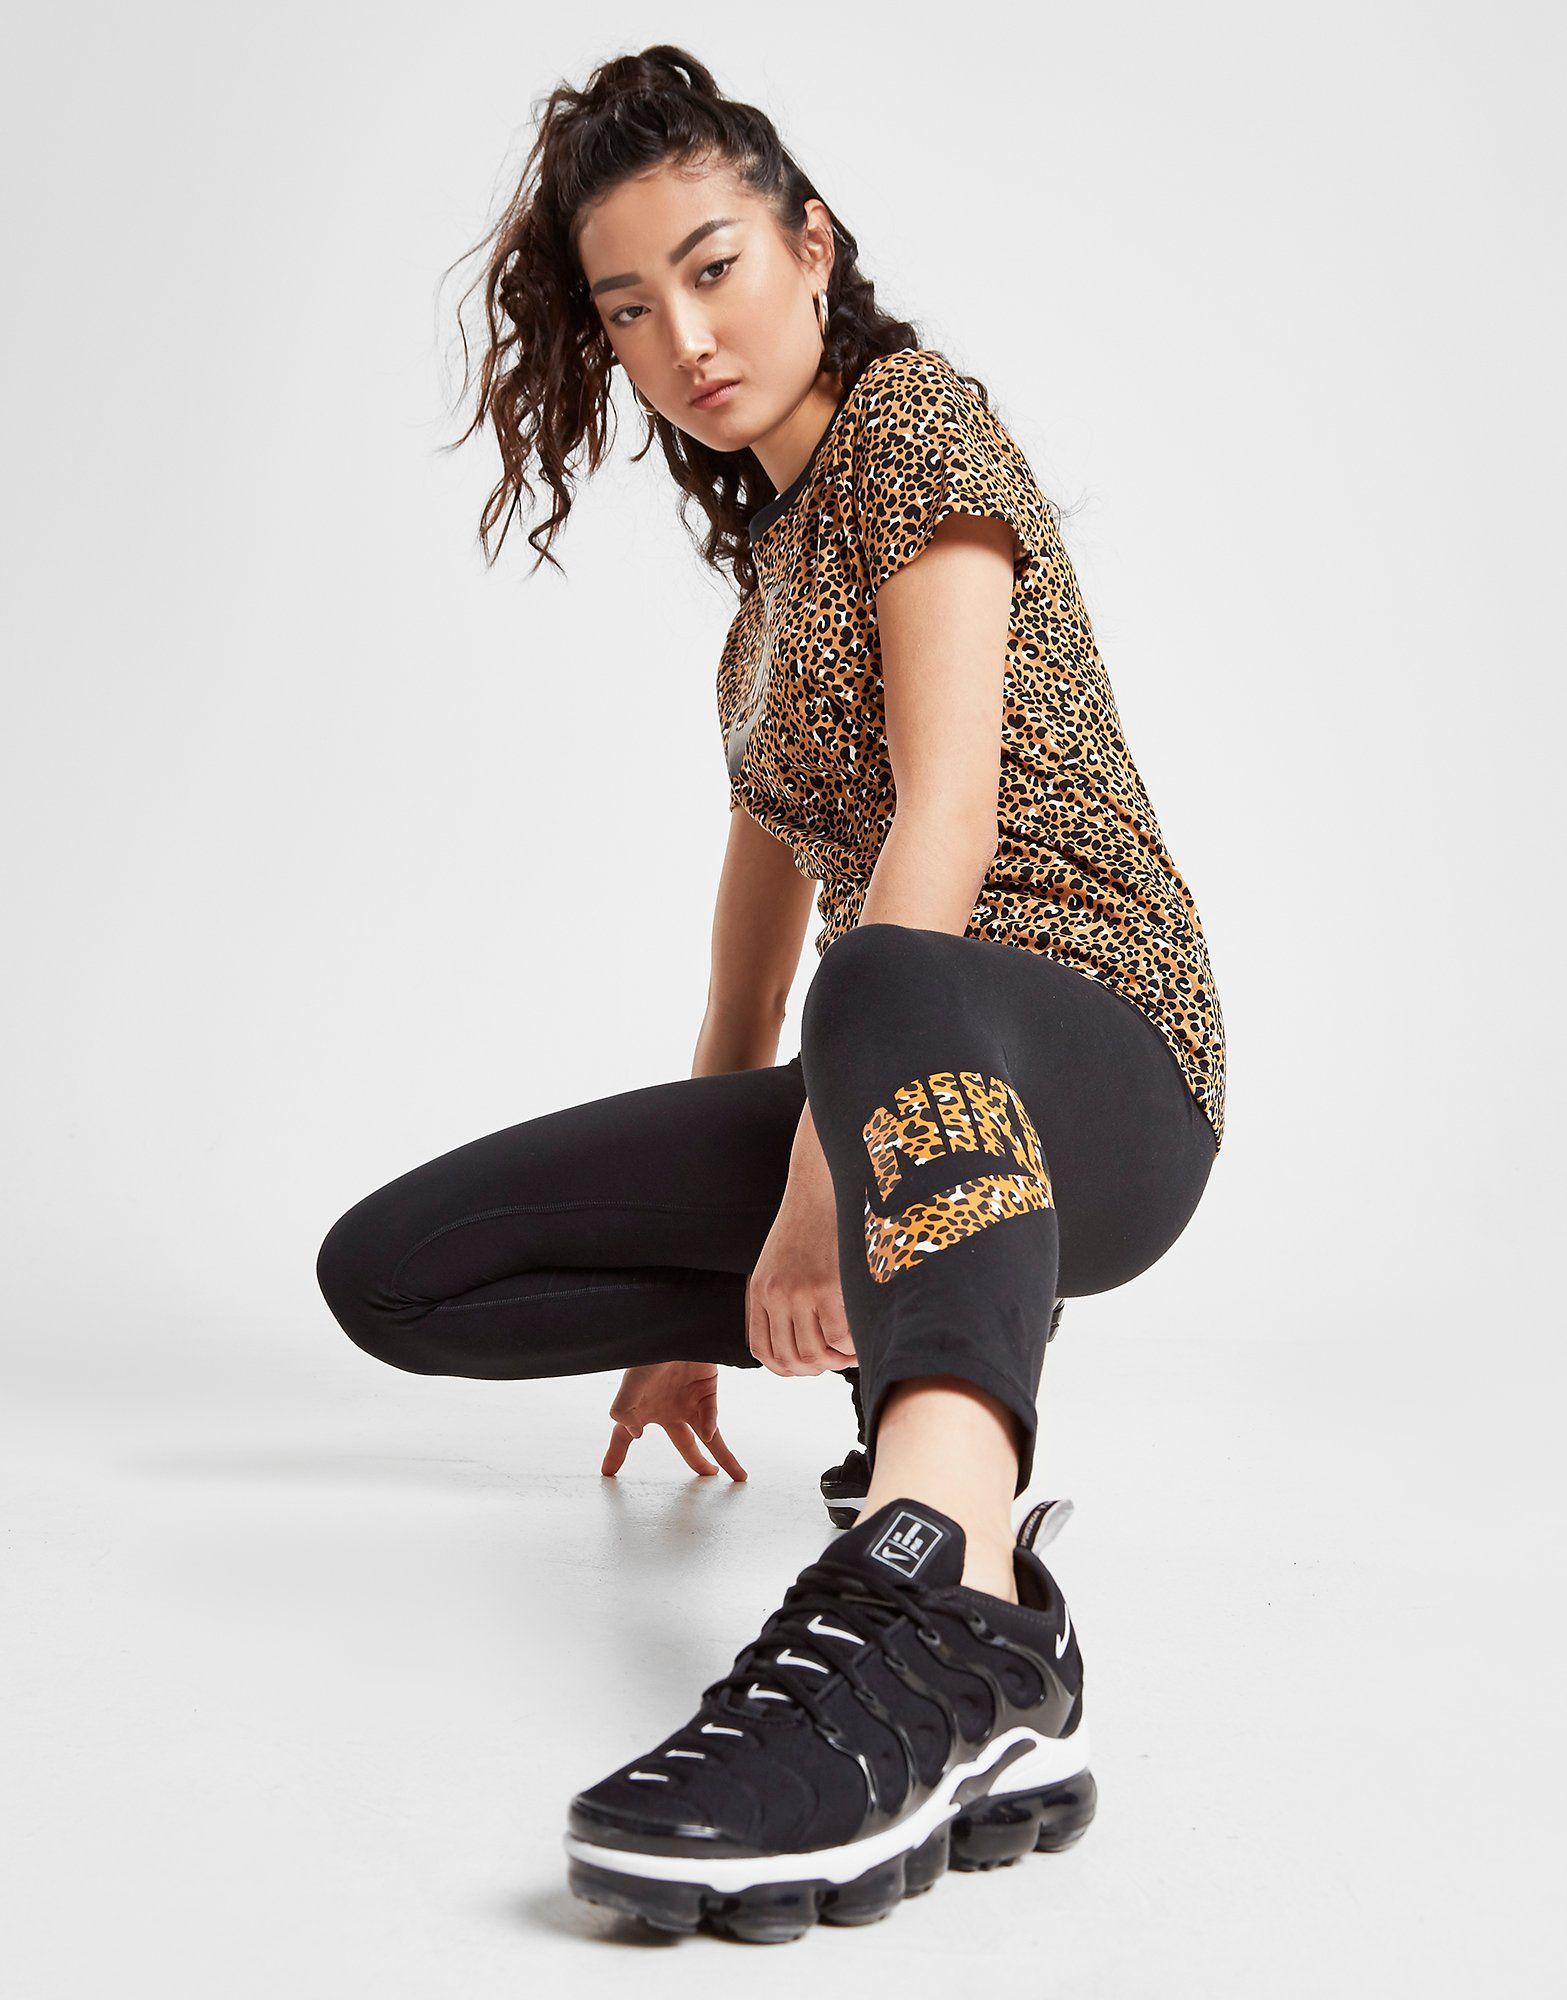 NIKE Nike Sportswear Animal Print Women's Leggings